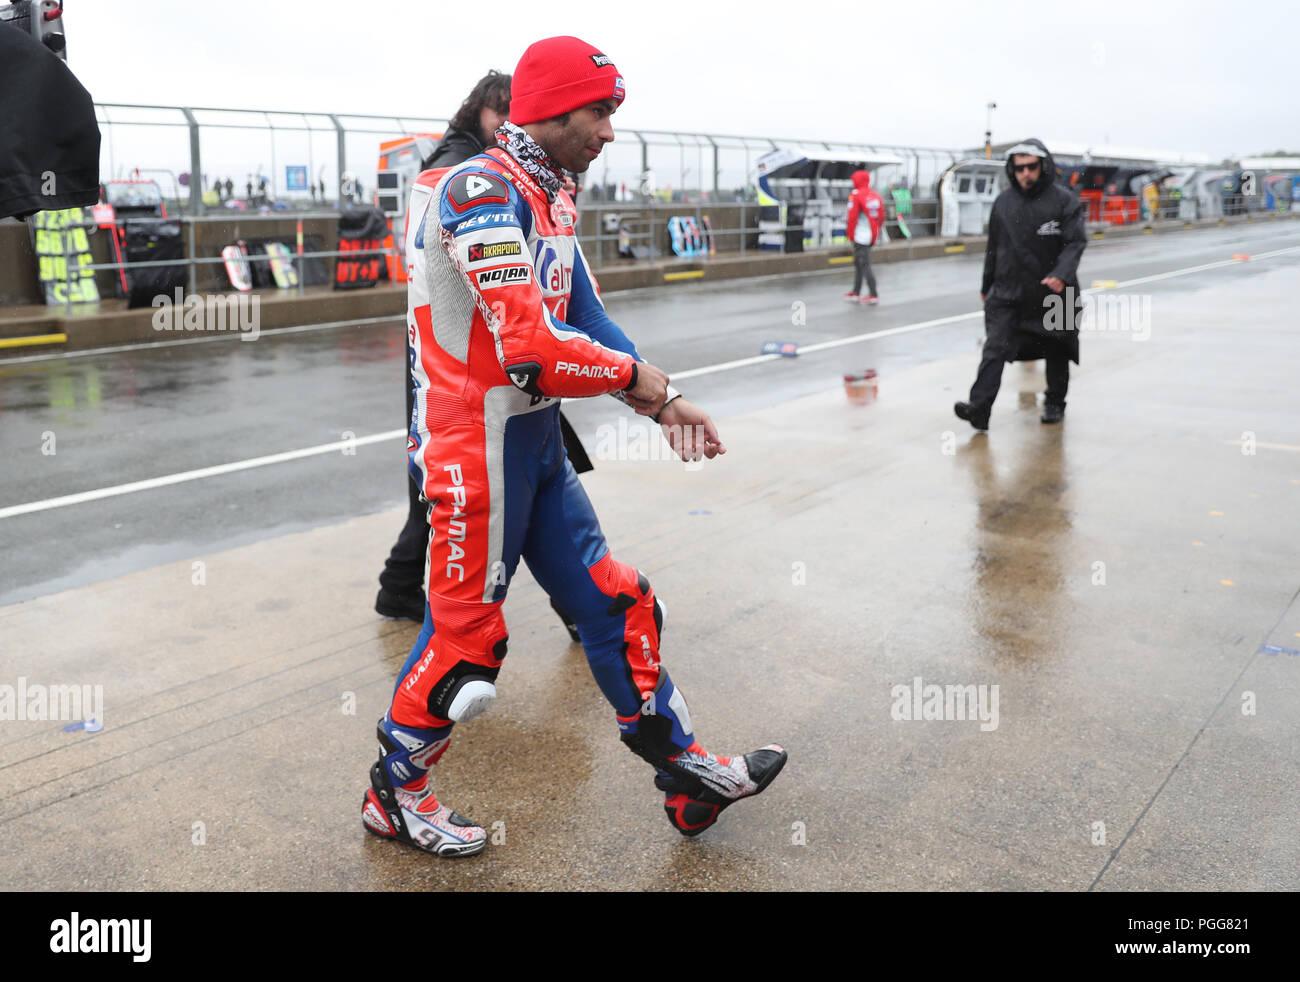 Danilo Petrucci in the pitlane as the GoPro British Grand Prix MotoGP is delayed at Silverstone, Towcester. - Stock Image